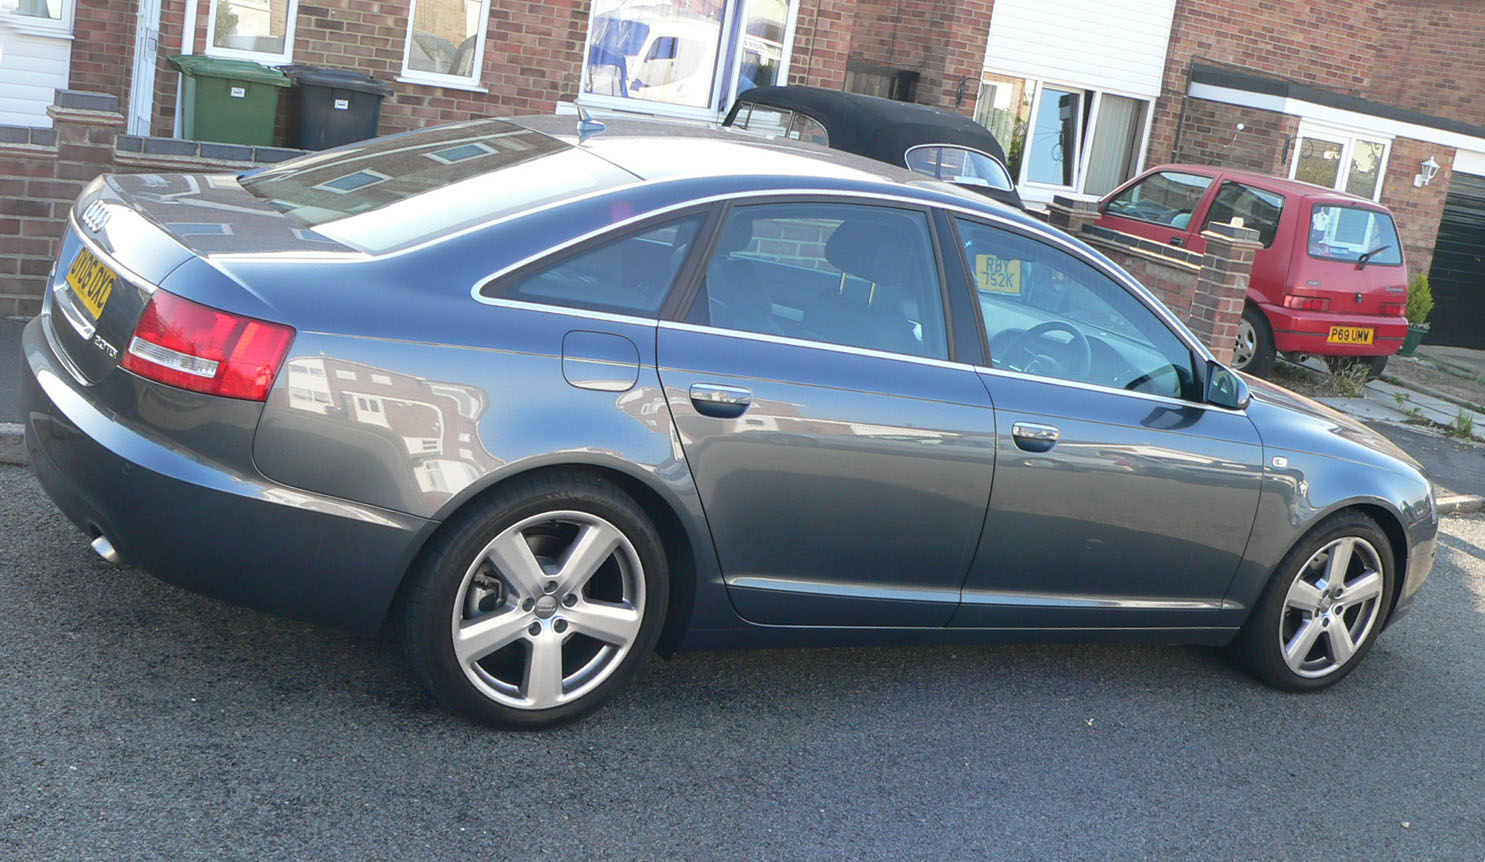 2006 Audi A6 Image 17